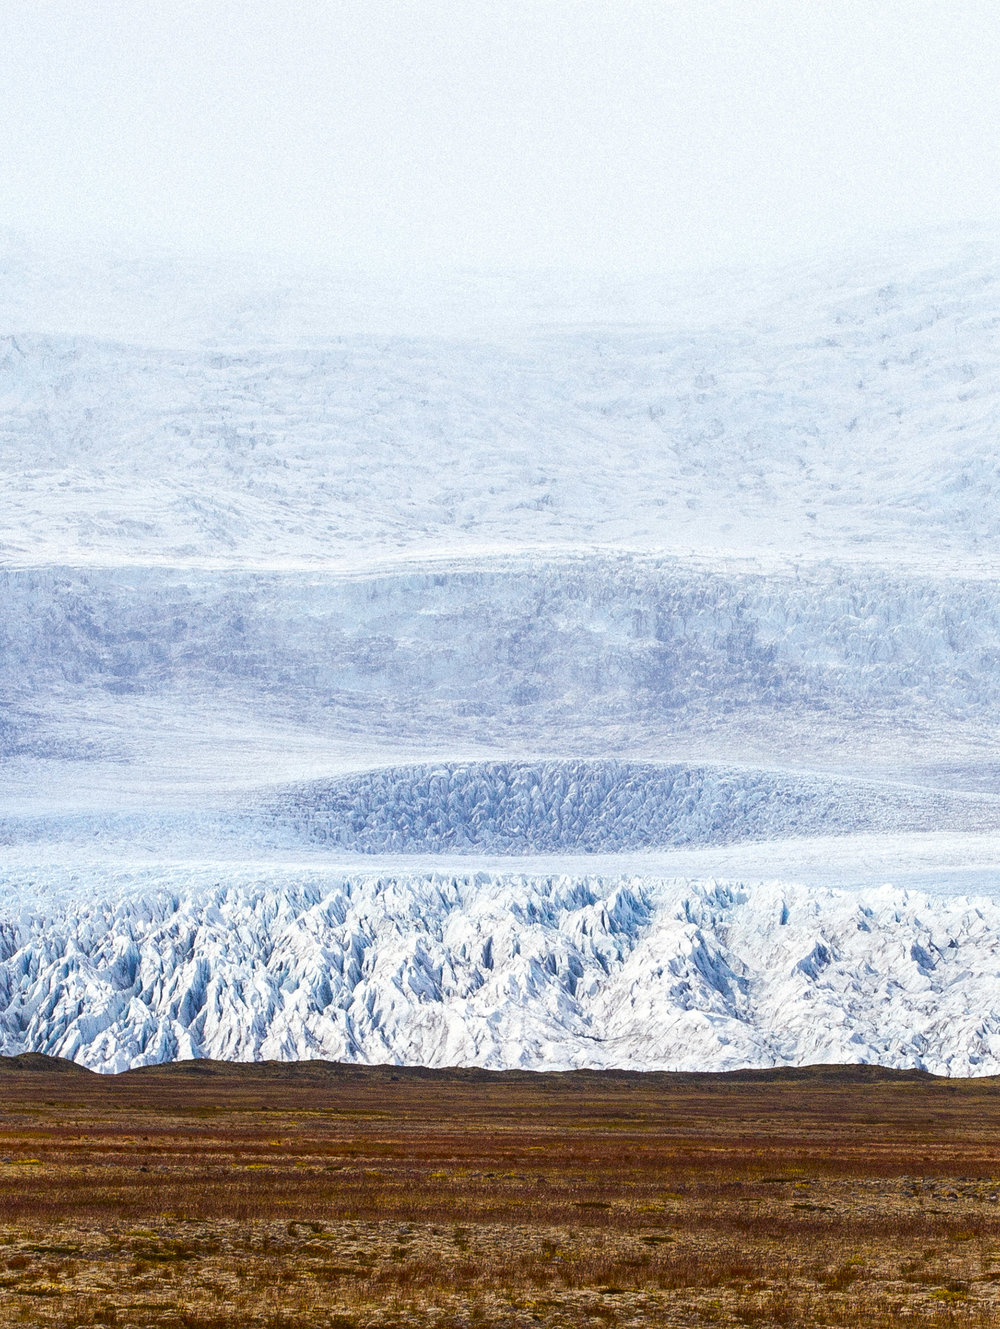 Glacier_Mountain_MG_5369.jpg